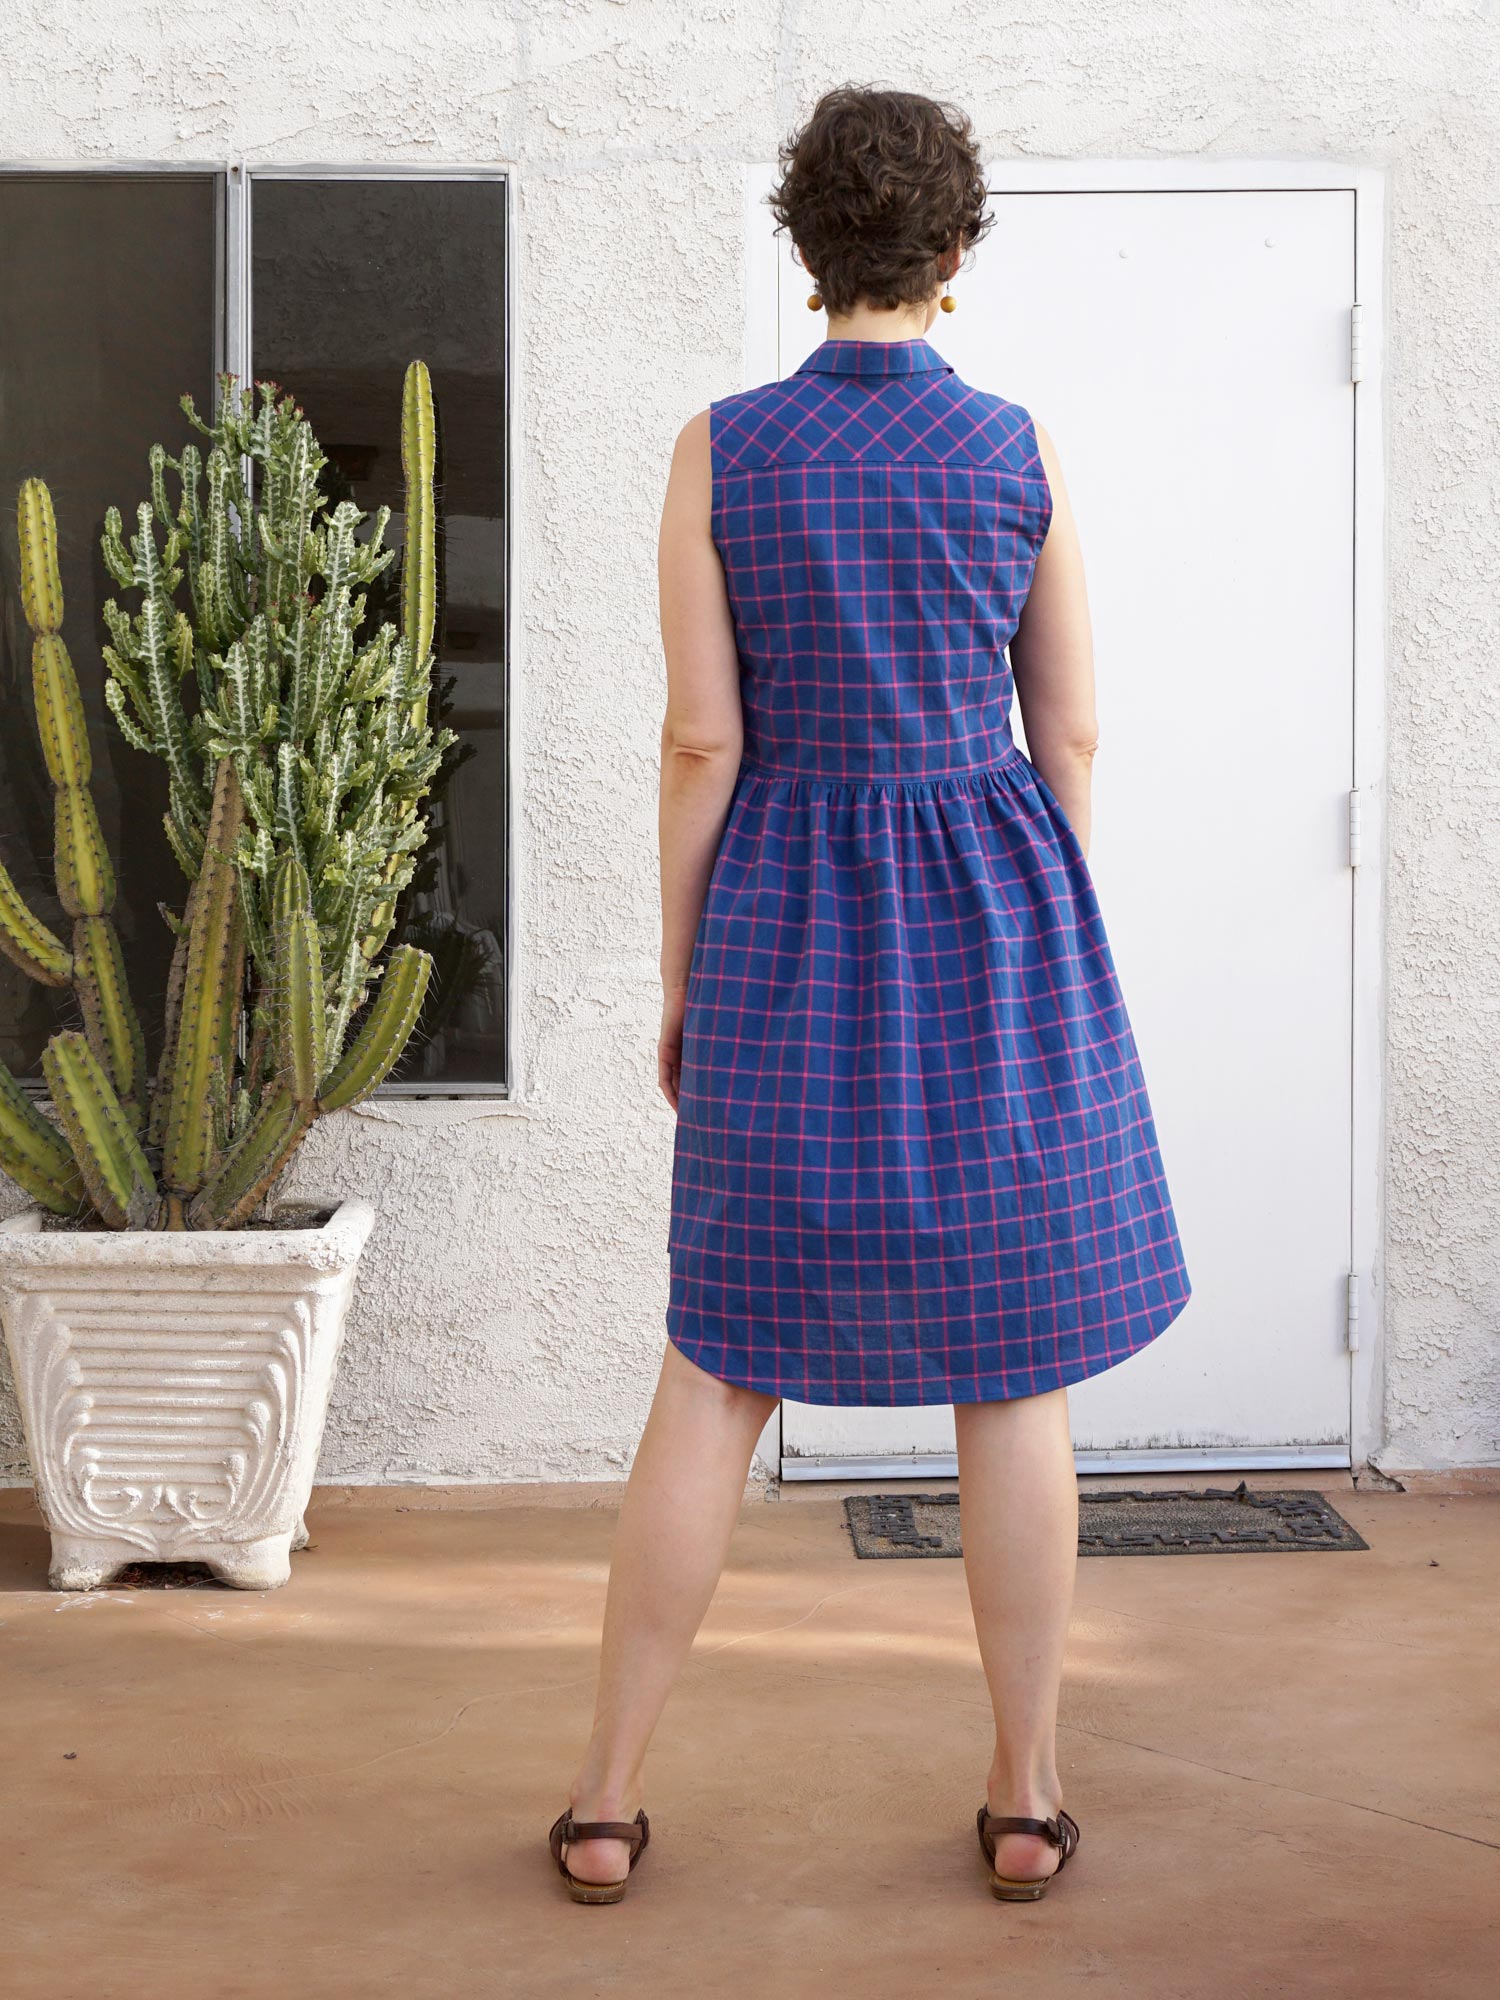 DIY Check Print Alder Shirtdress | Sew DIY